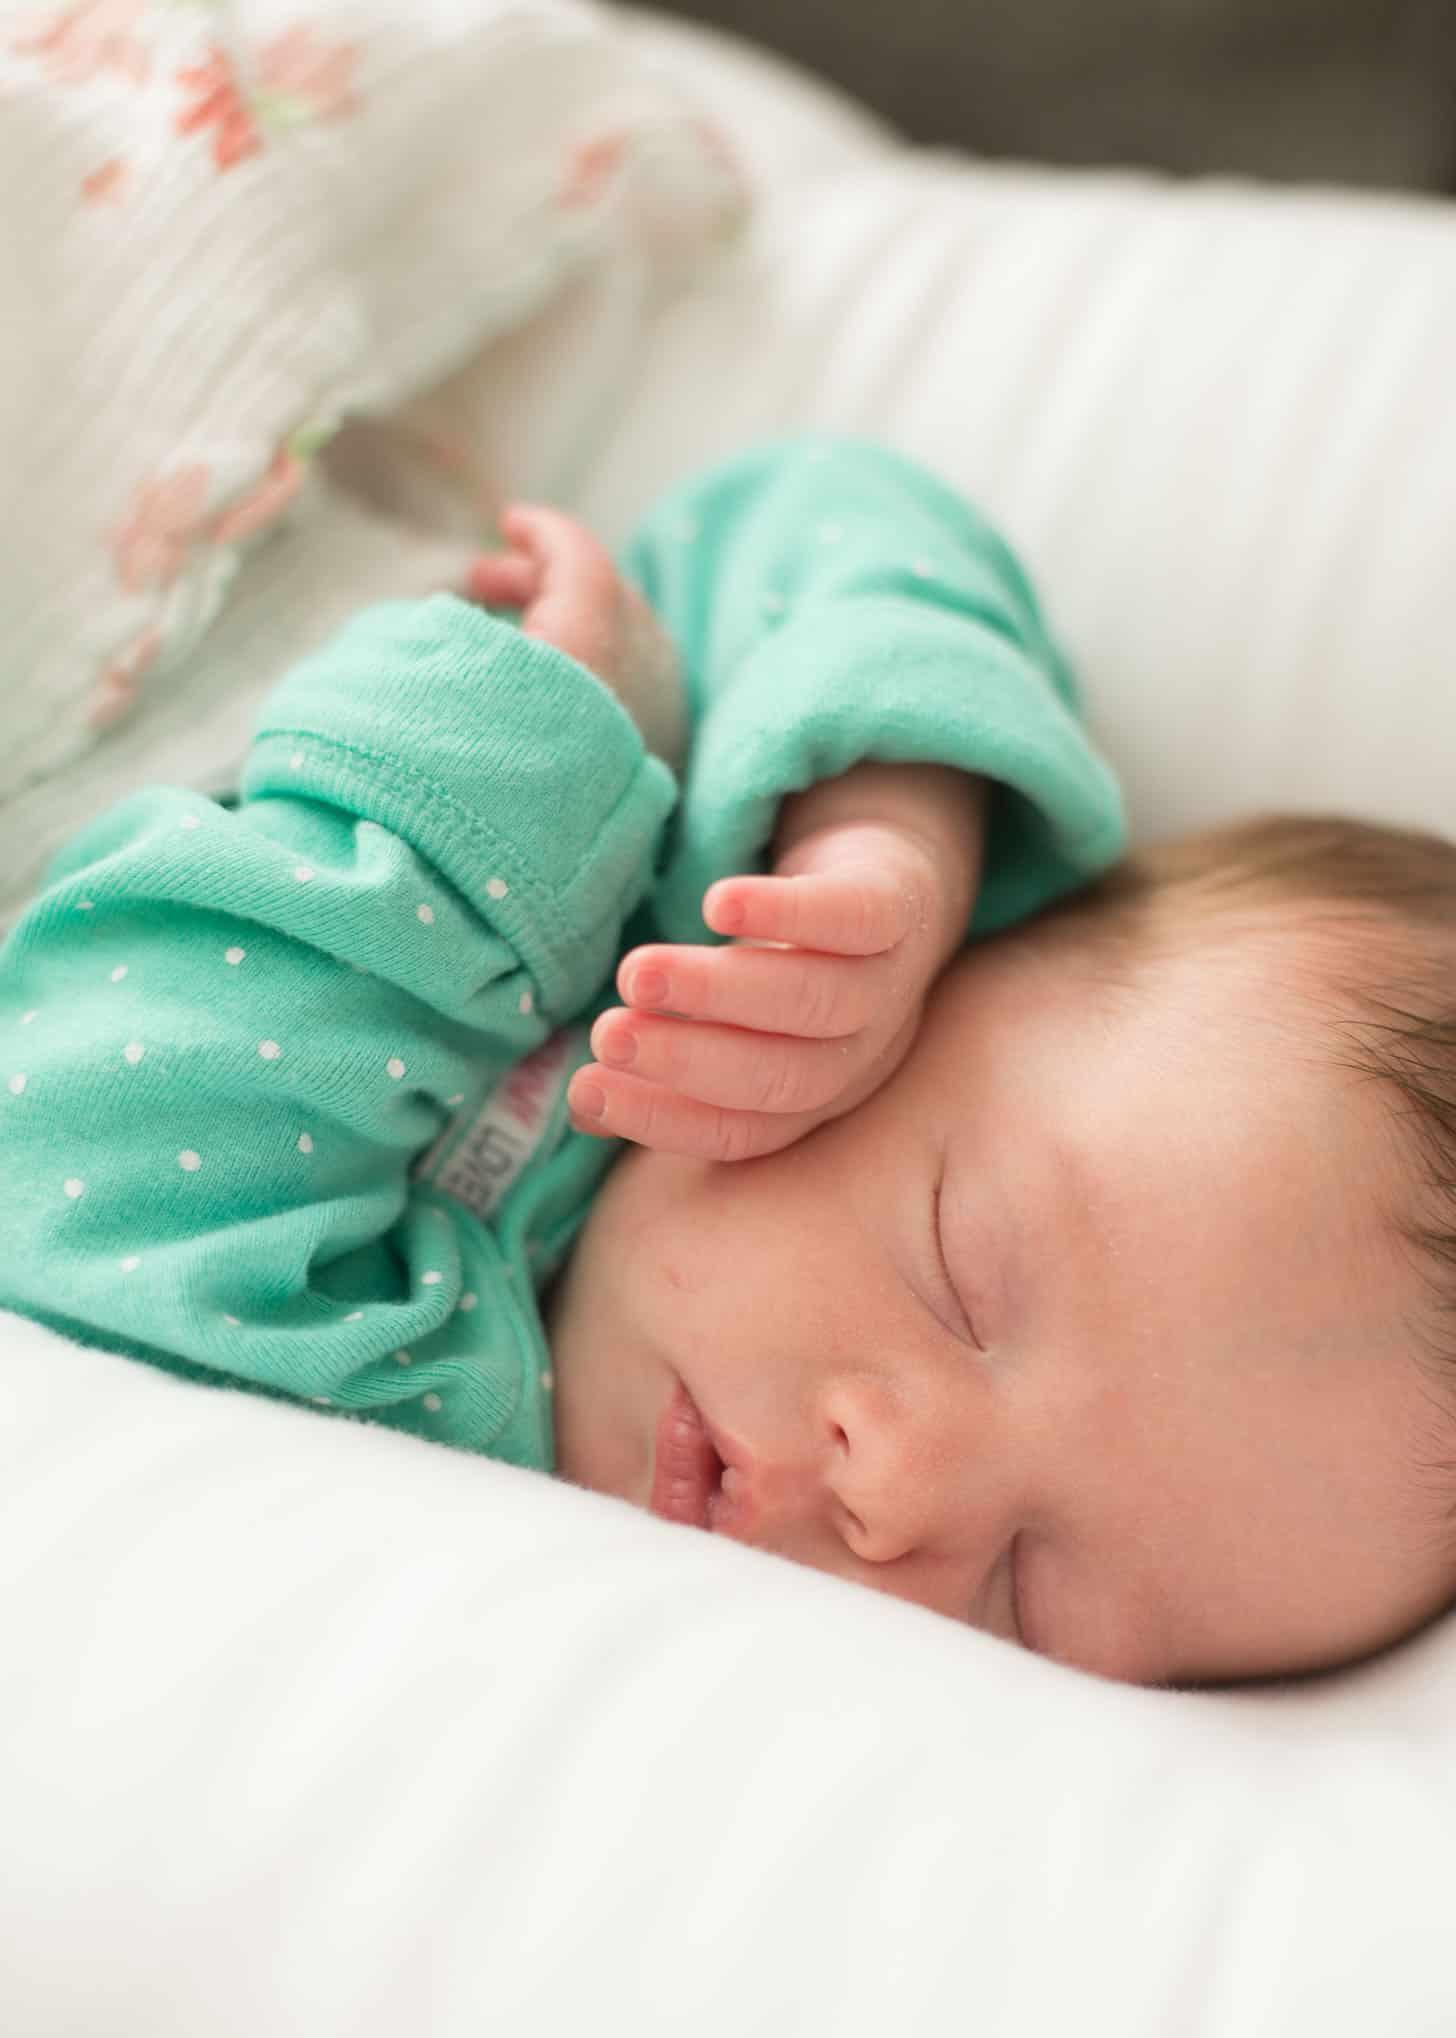 baby june sleeping